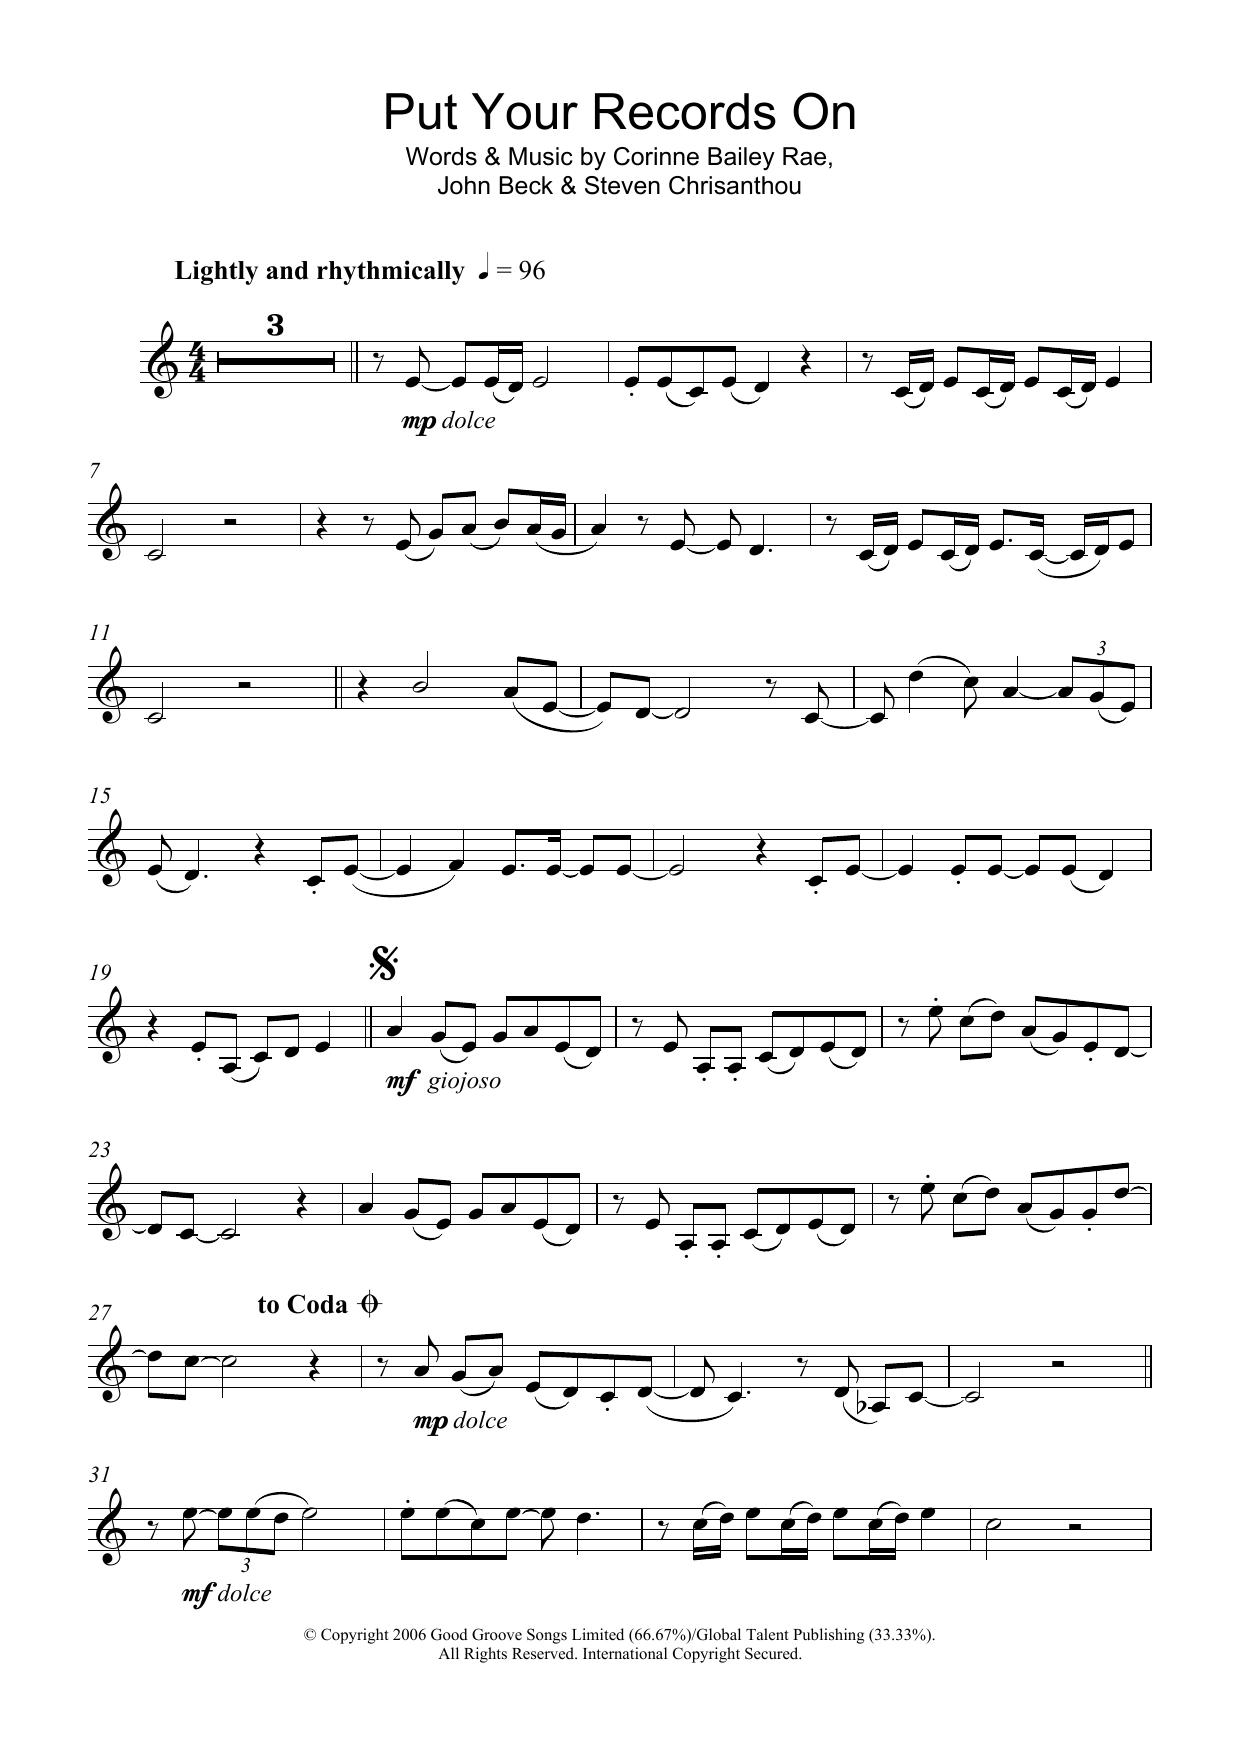 Sheet Music Digital Files To Print Licensed Steven Chrisanthou